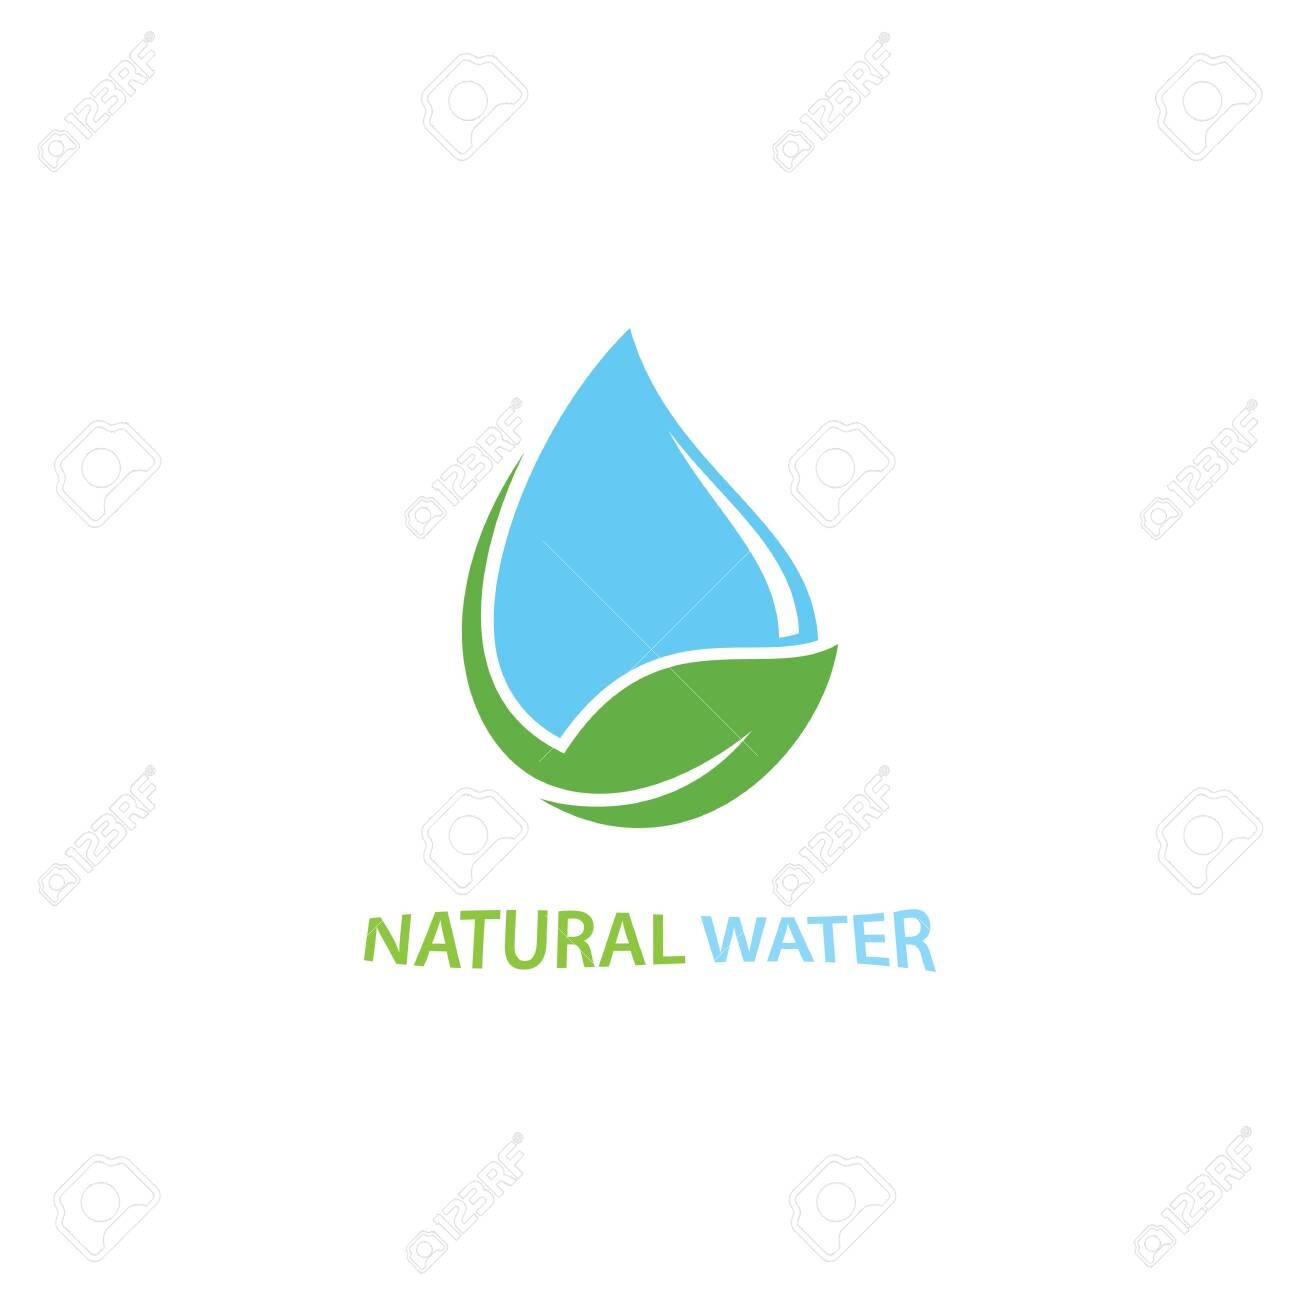 water drop Logo Template vector illustration - 154071995